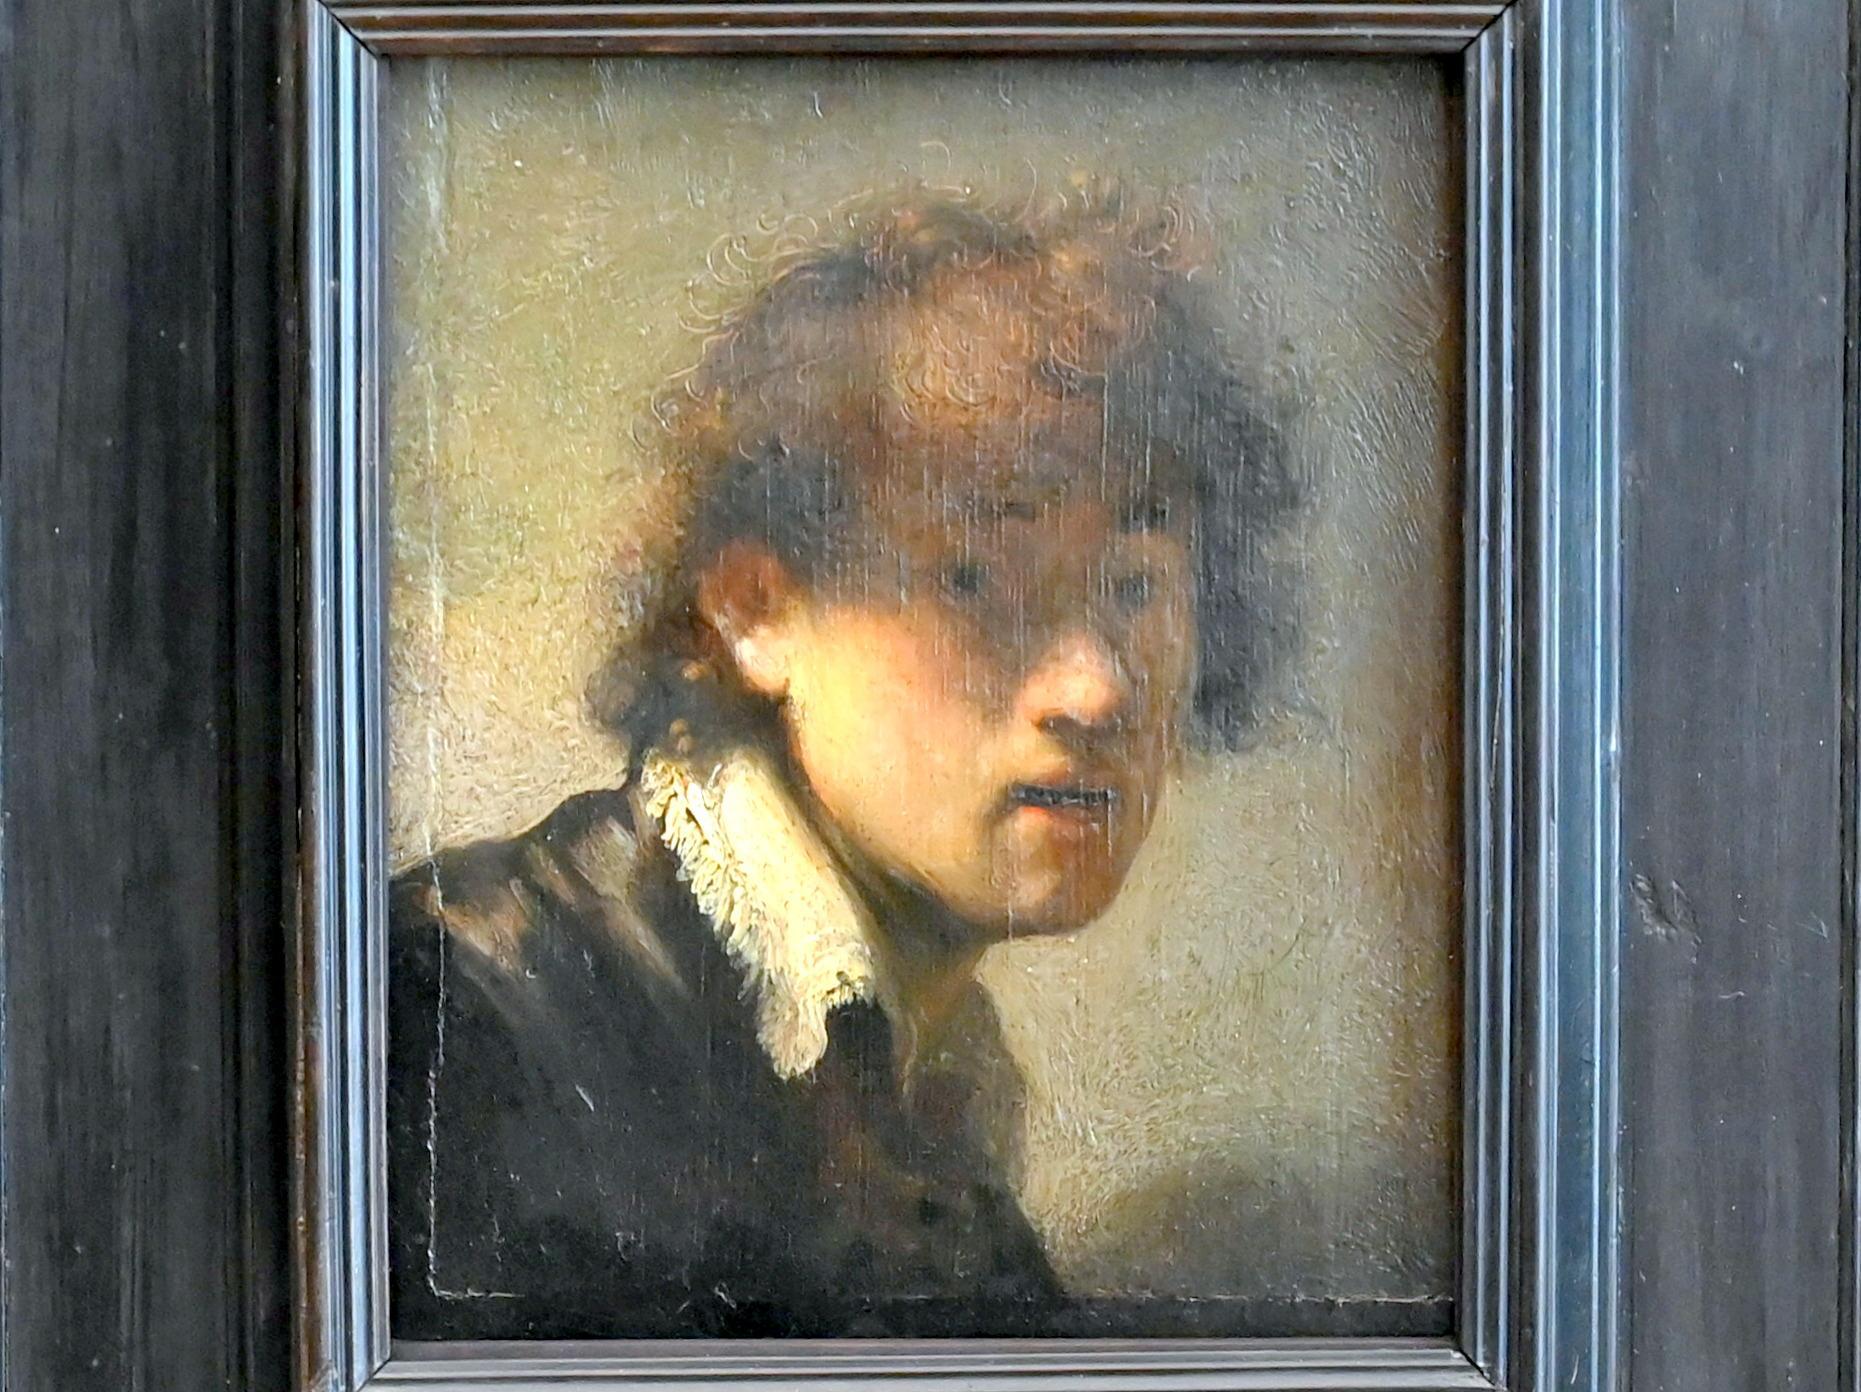 Rembrandt (Rembrandt Harmenszoon van Rijn) (1606 Leiden - 1669 Amsterdam), Bild 1/11